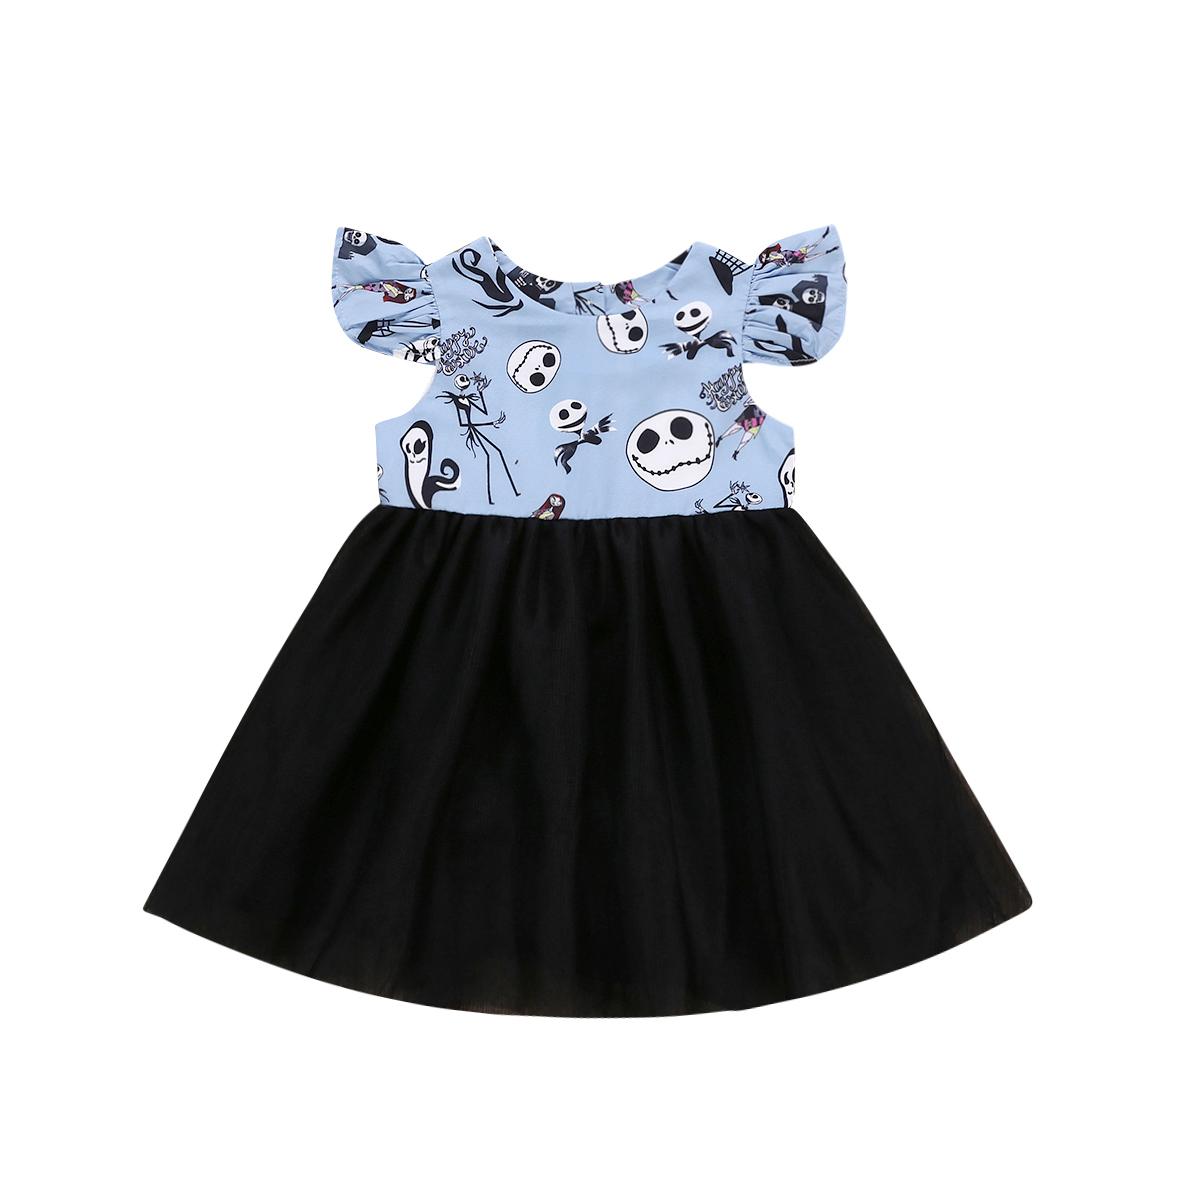 6663c8f4ce6 Toddler Kid Girls Princess Halloween Children Tulle Party Pageant Dress  Cartoon Ghost Pattern Sundress